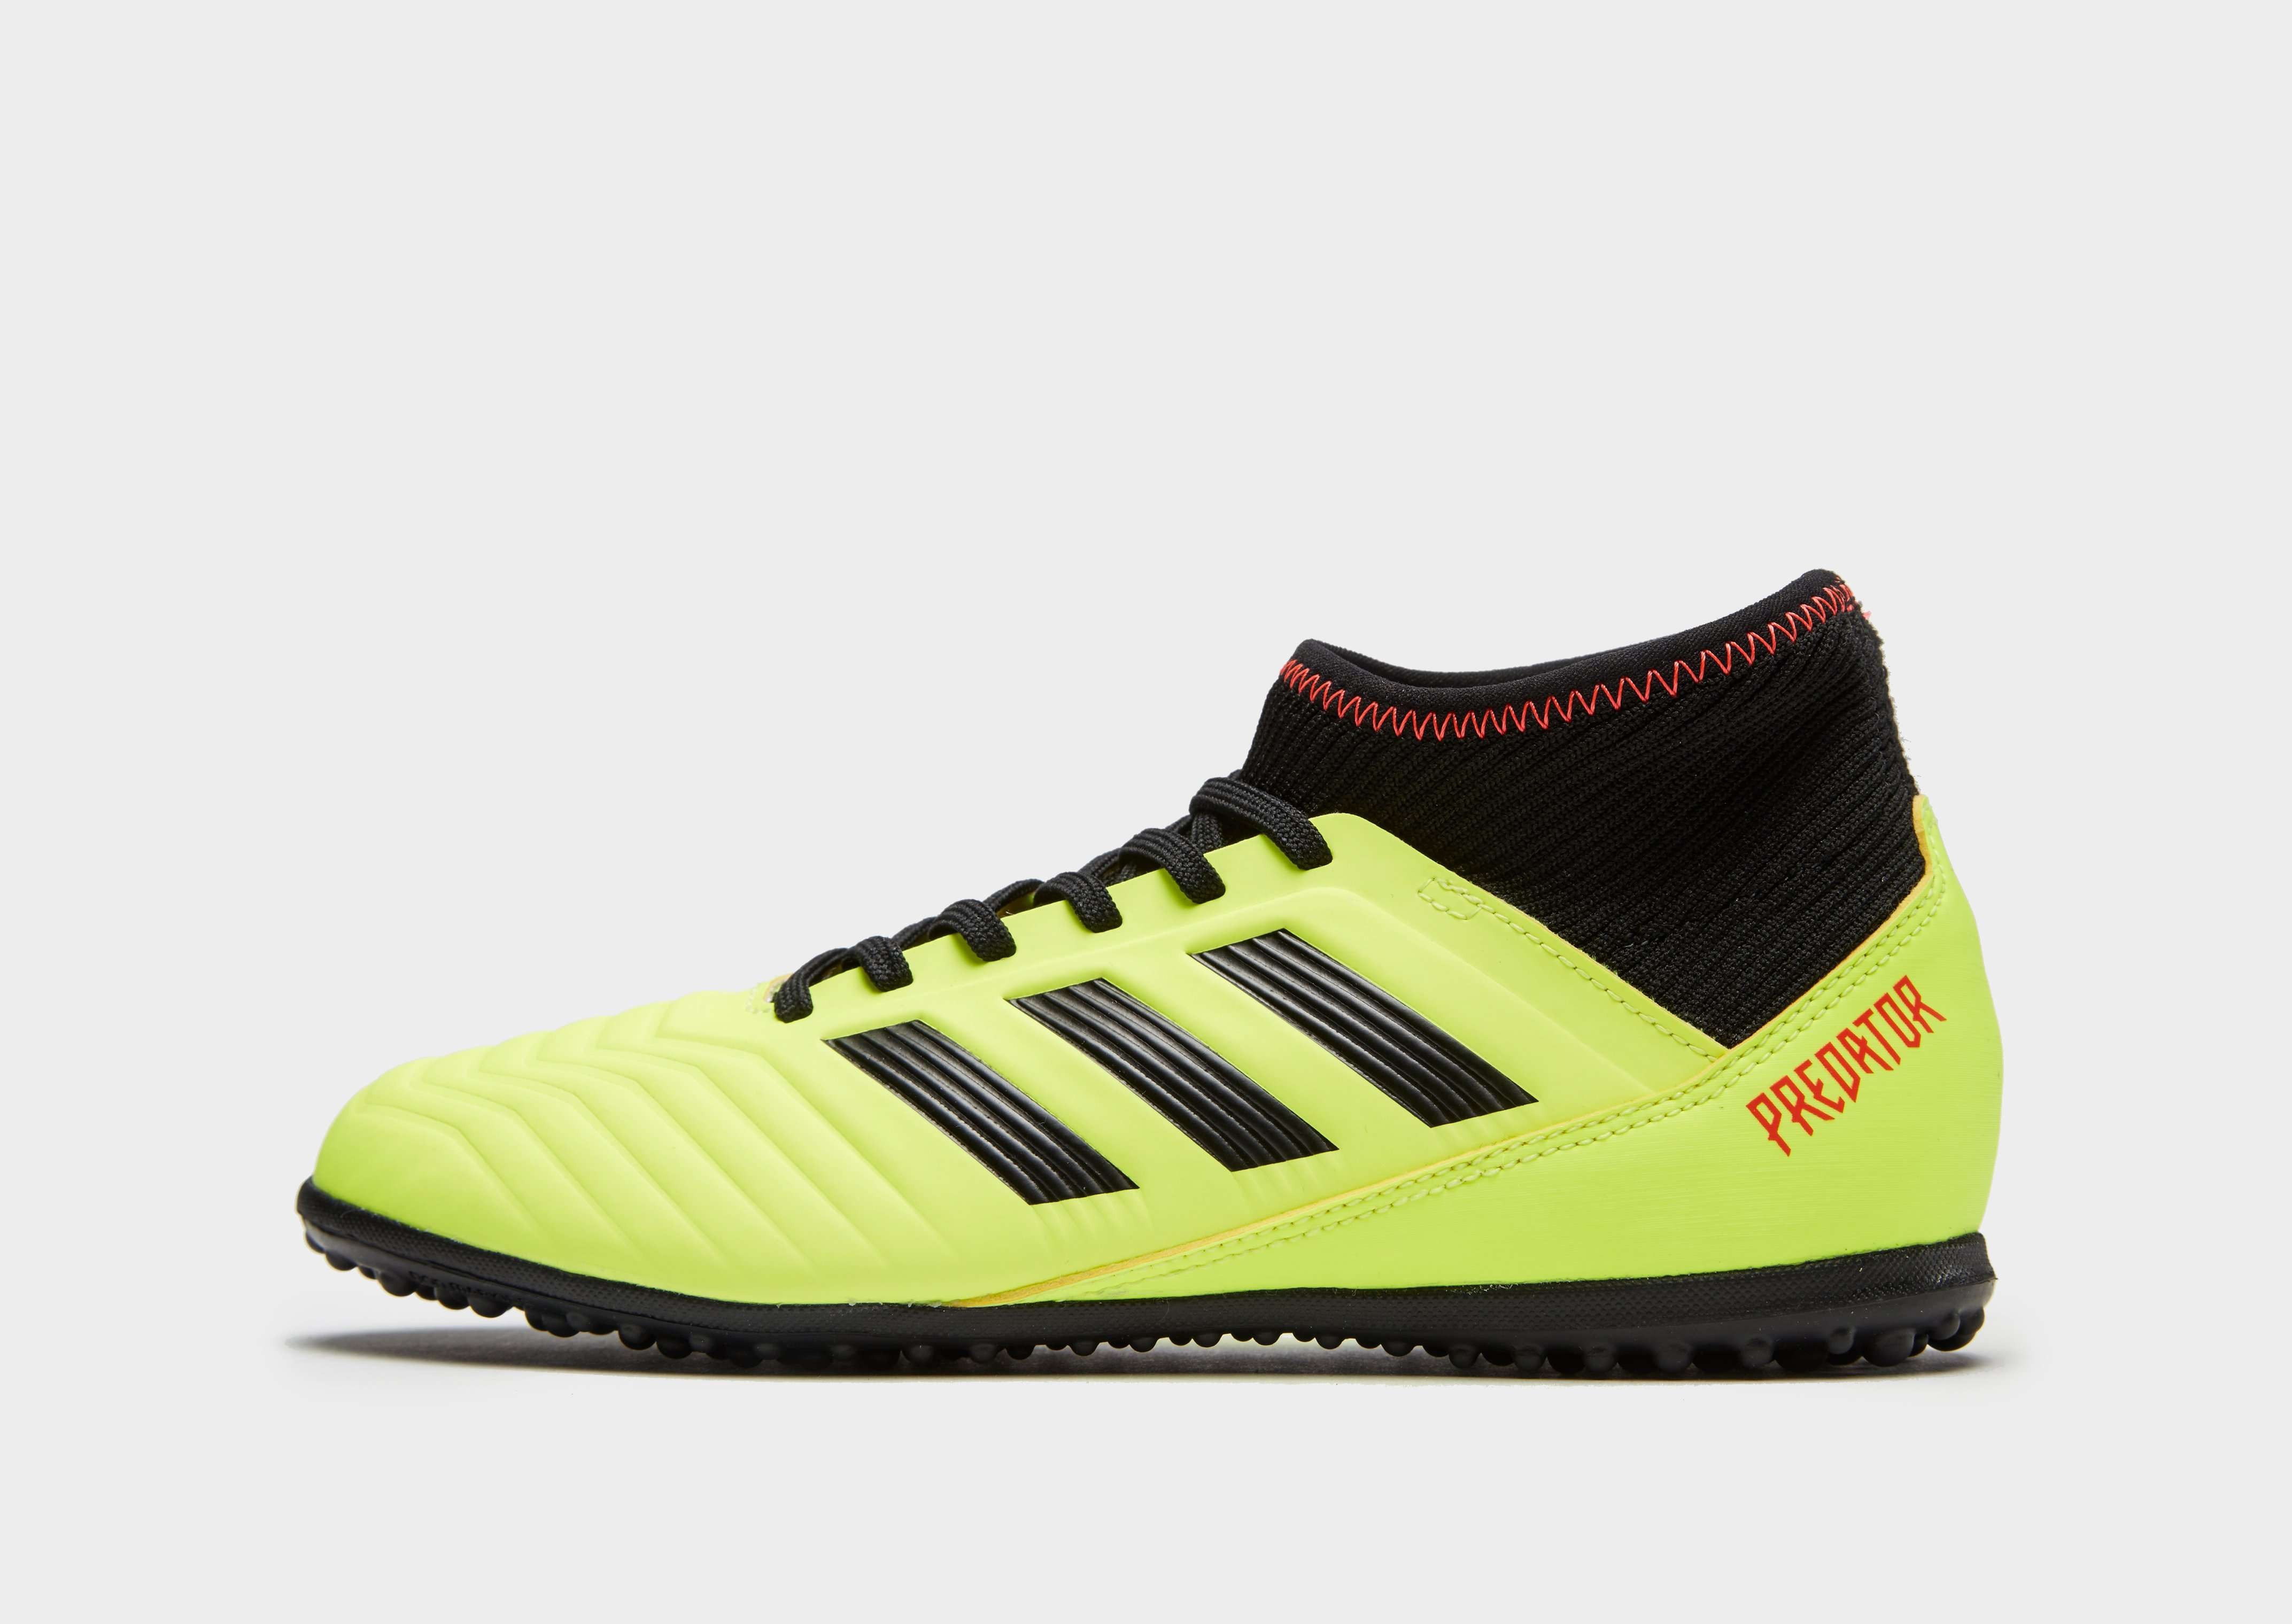 on sale fc56a 561b1 adidas Energy Mode Predator 18.3 TF Children  JD Sports